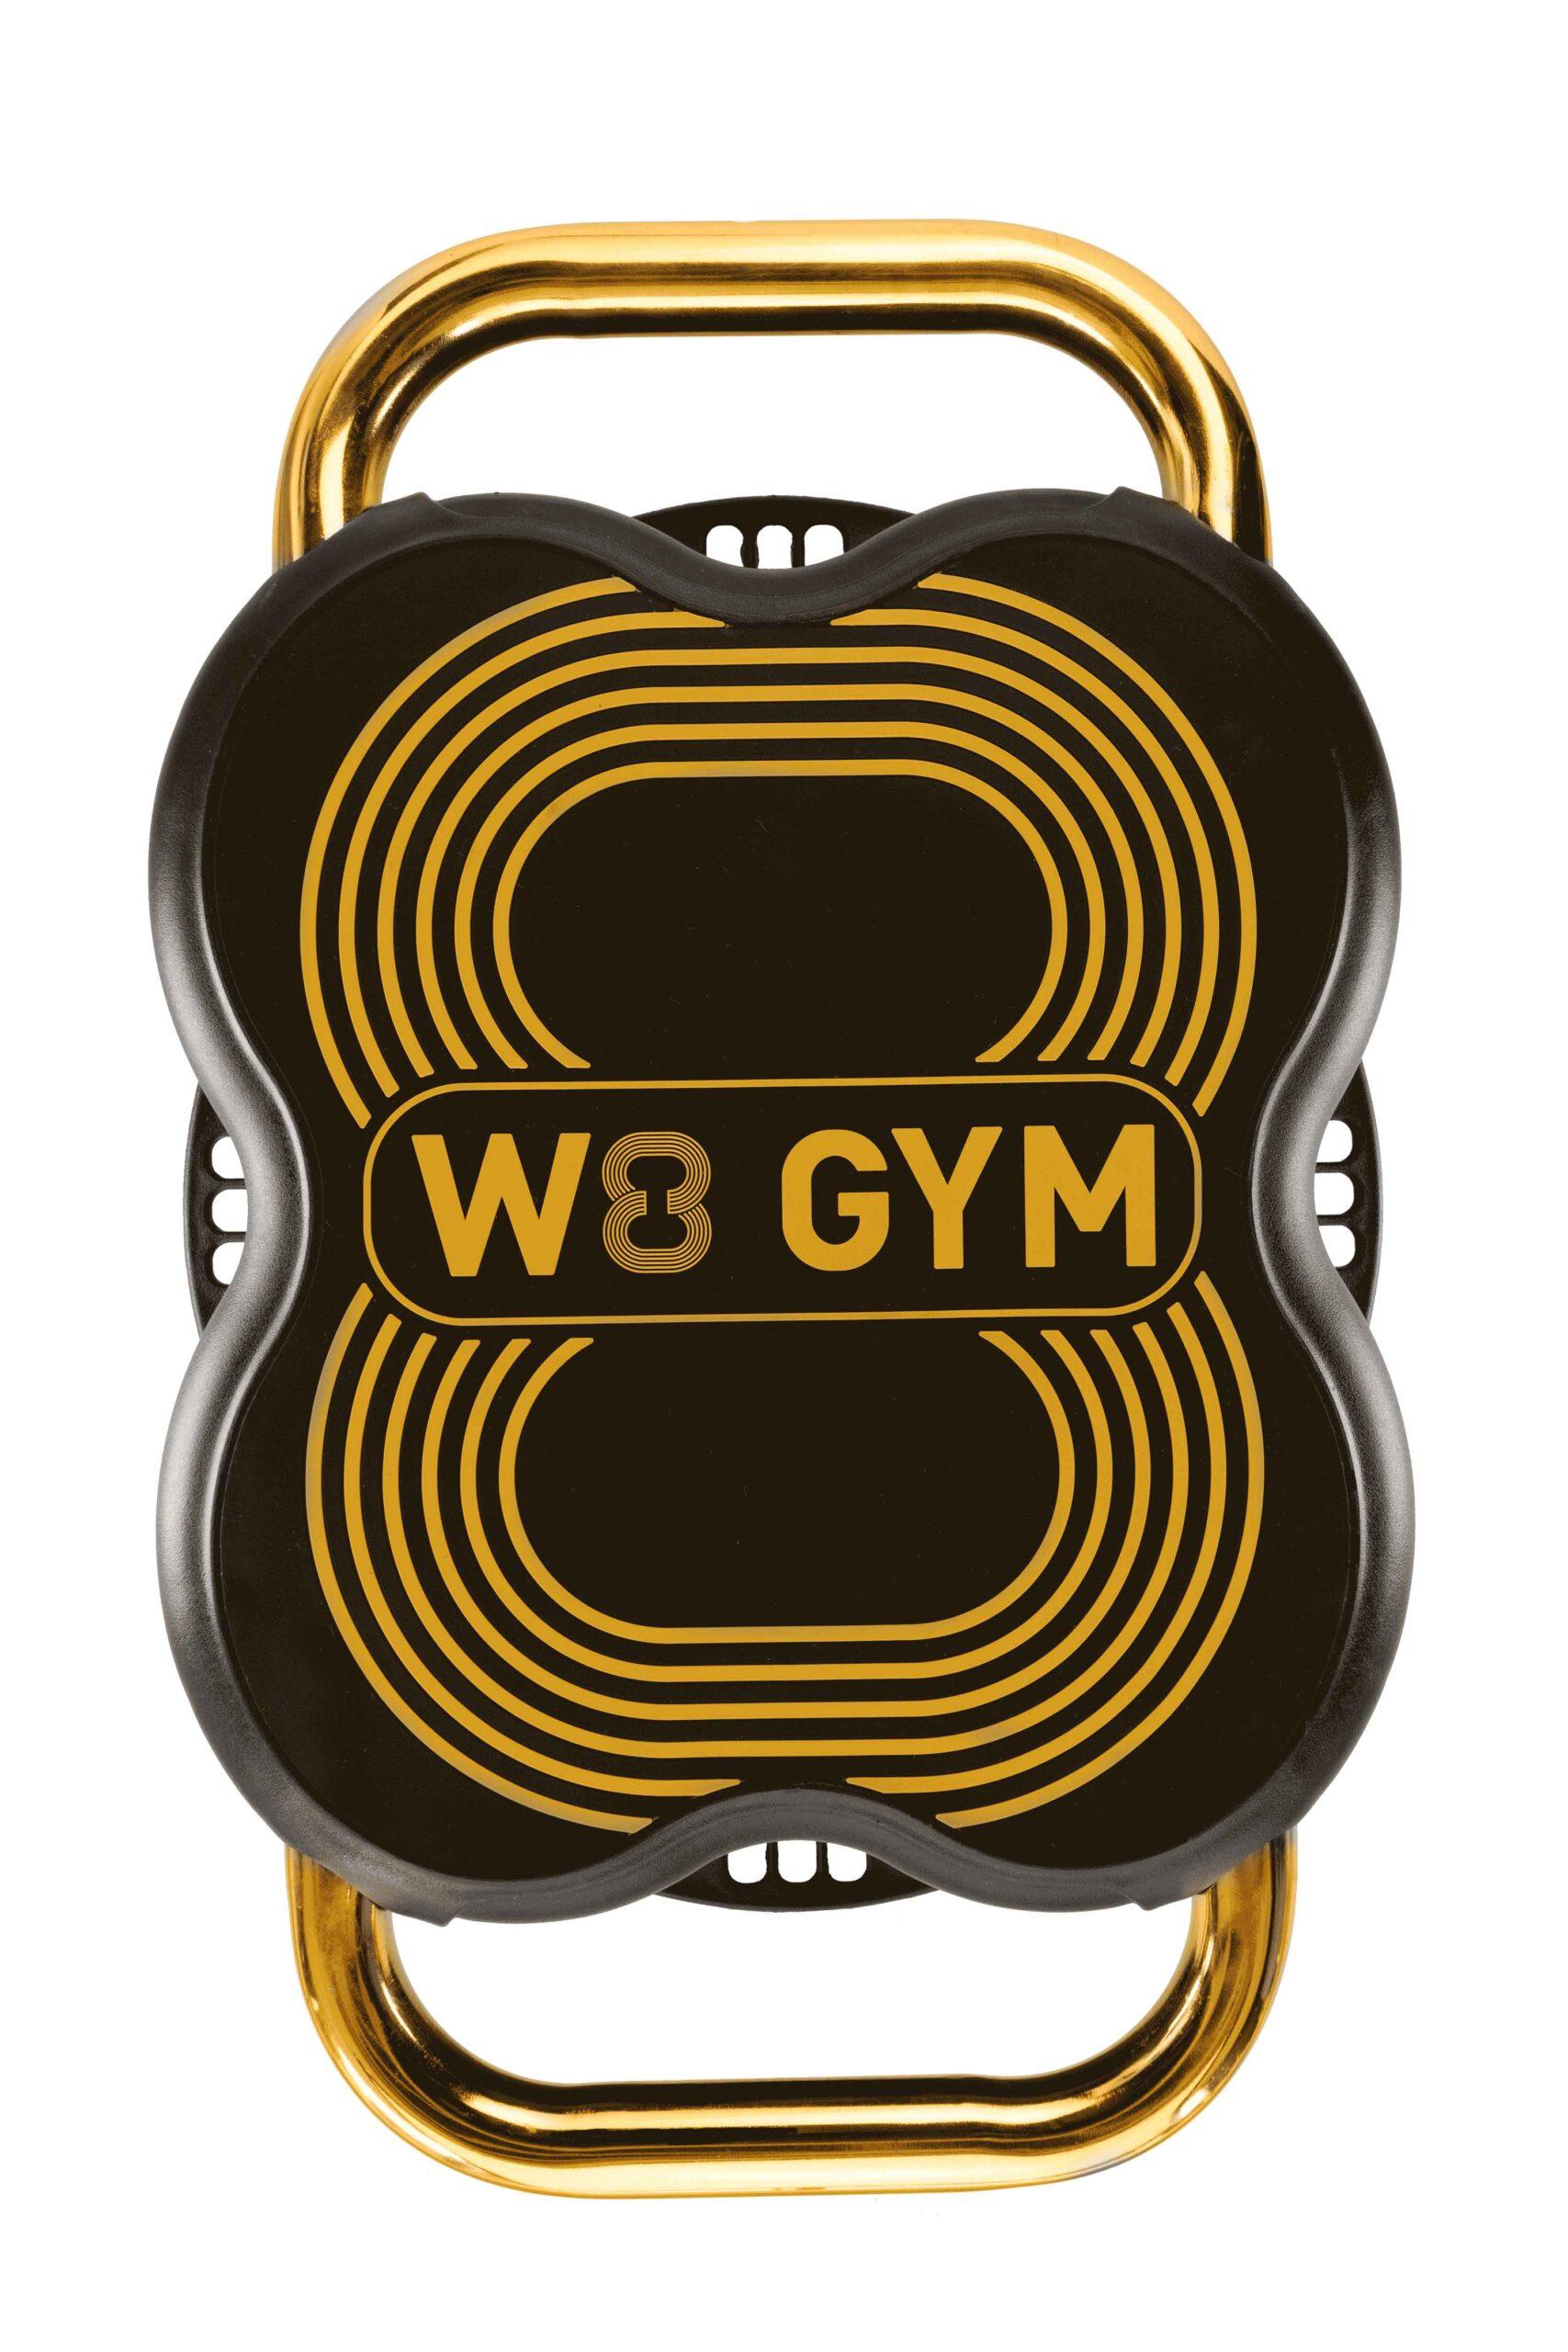 W8 GYM Gold Limited Edition